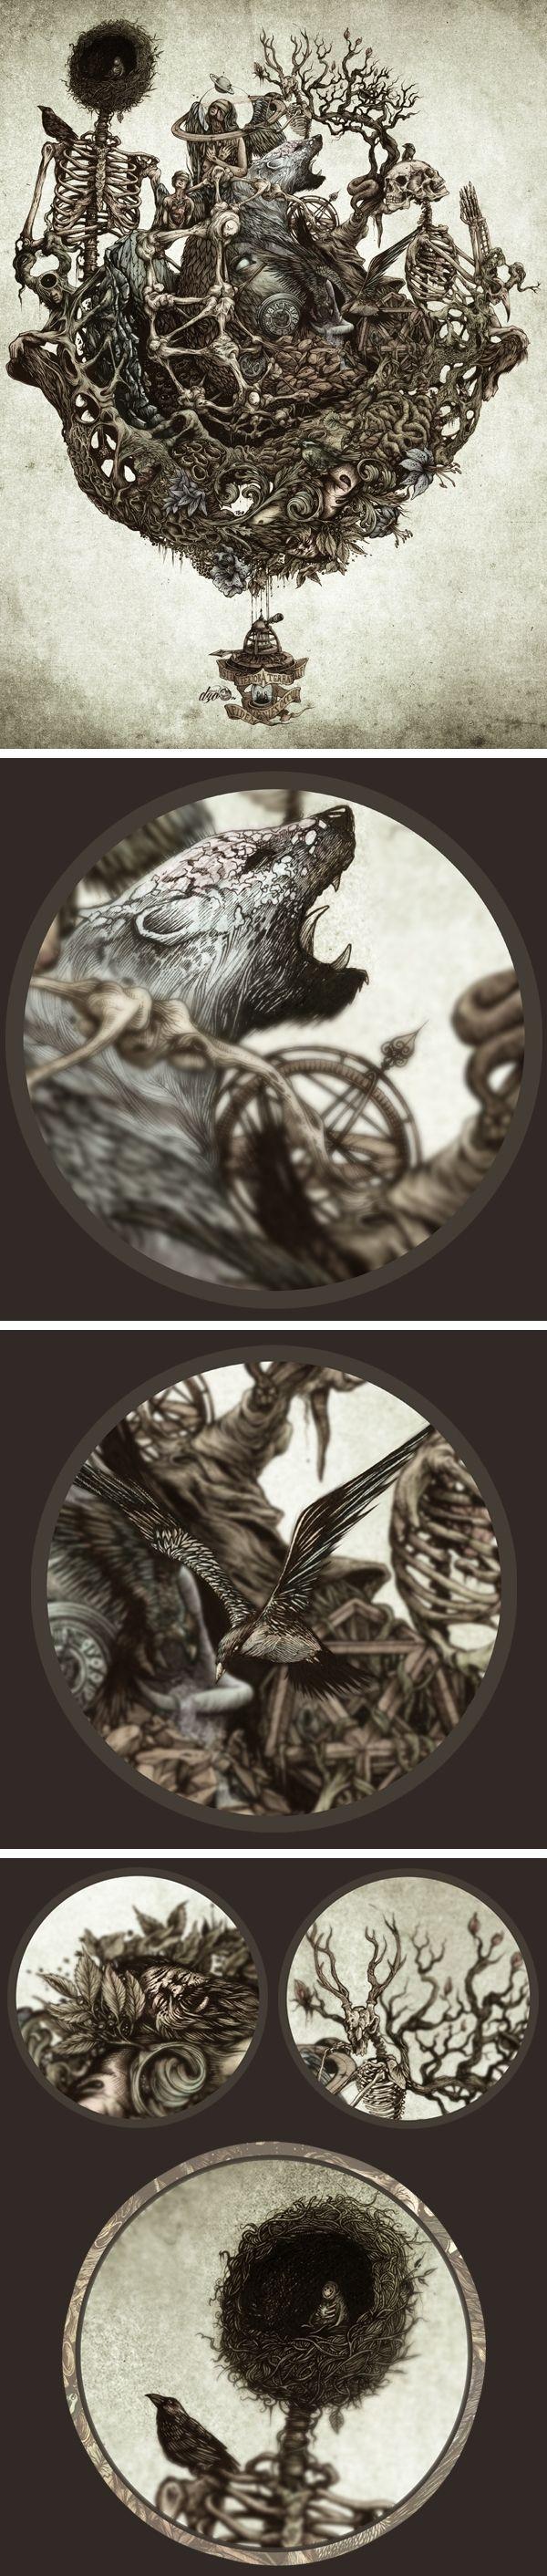 Gaia Calling ~ artist DZO Olivier; pencil, ink, digital media.  Wonderful details.  #art #illustration #mytumblr